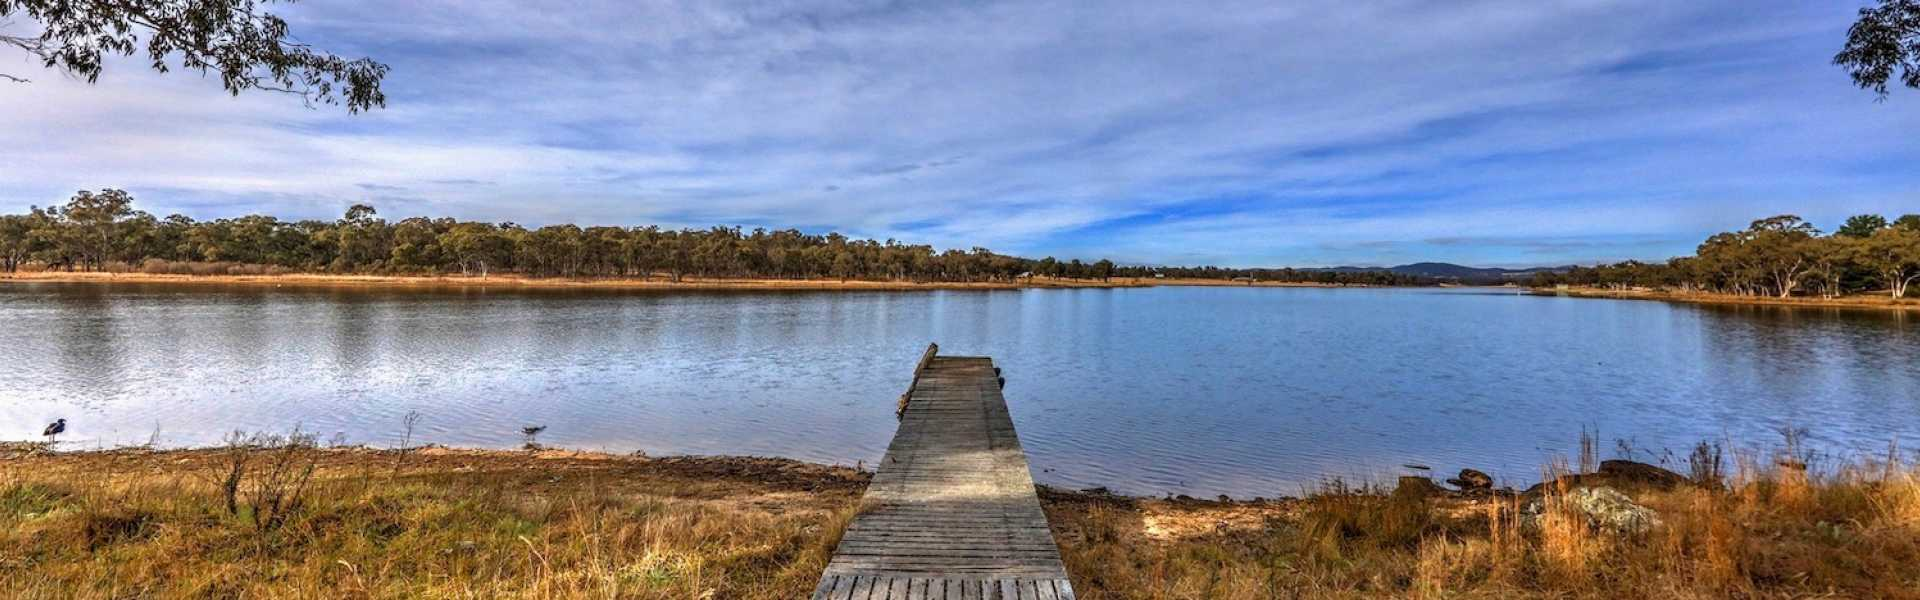 Kui Parks, Sommerville Valley Tourist Park, Stanthorpe, Dam